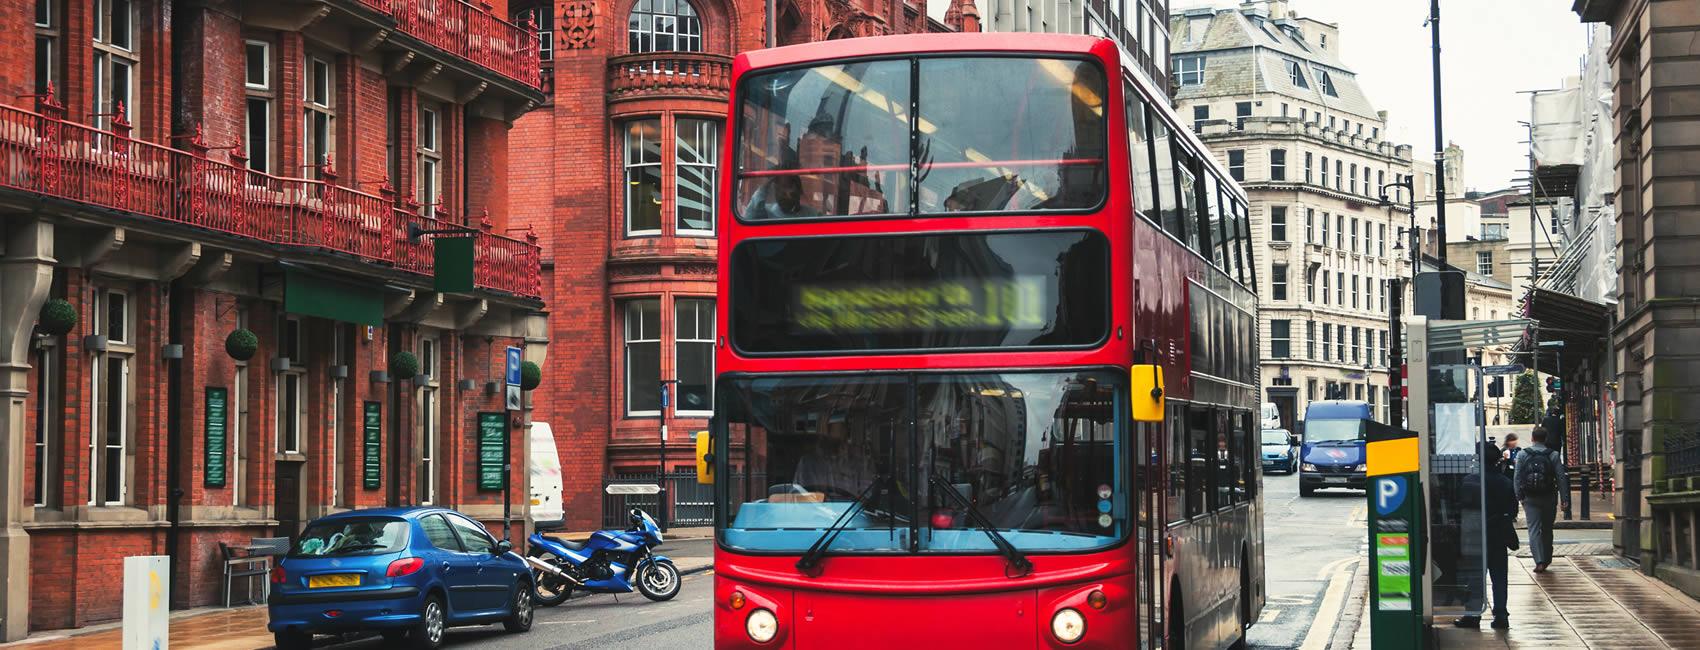 Central Birmingham red bus in traffic